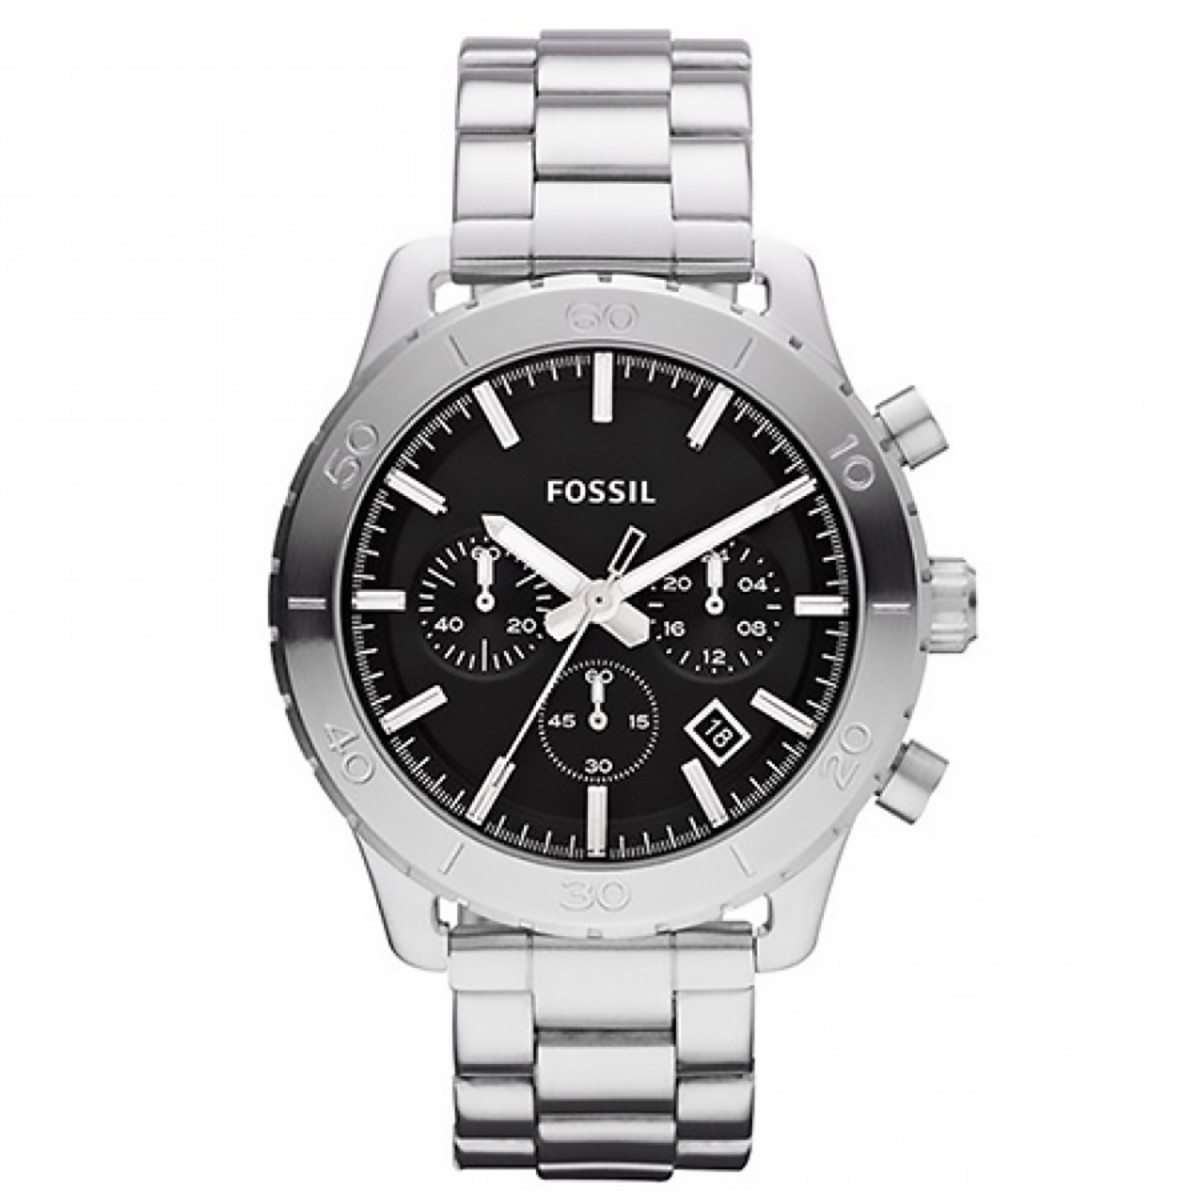 Relógio Fossil Keaton - Tri-Jóia Shop 0dc414358a